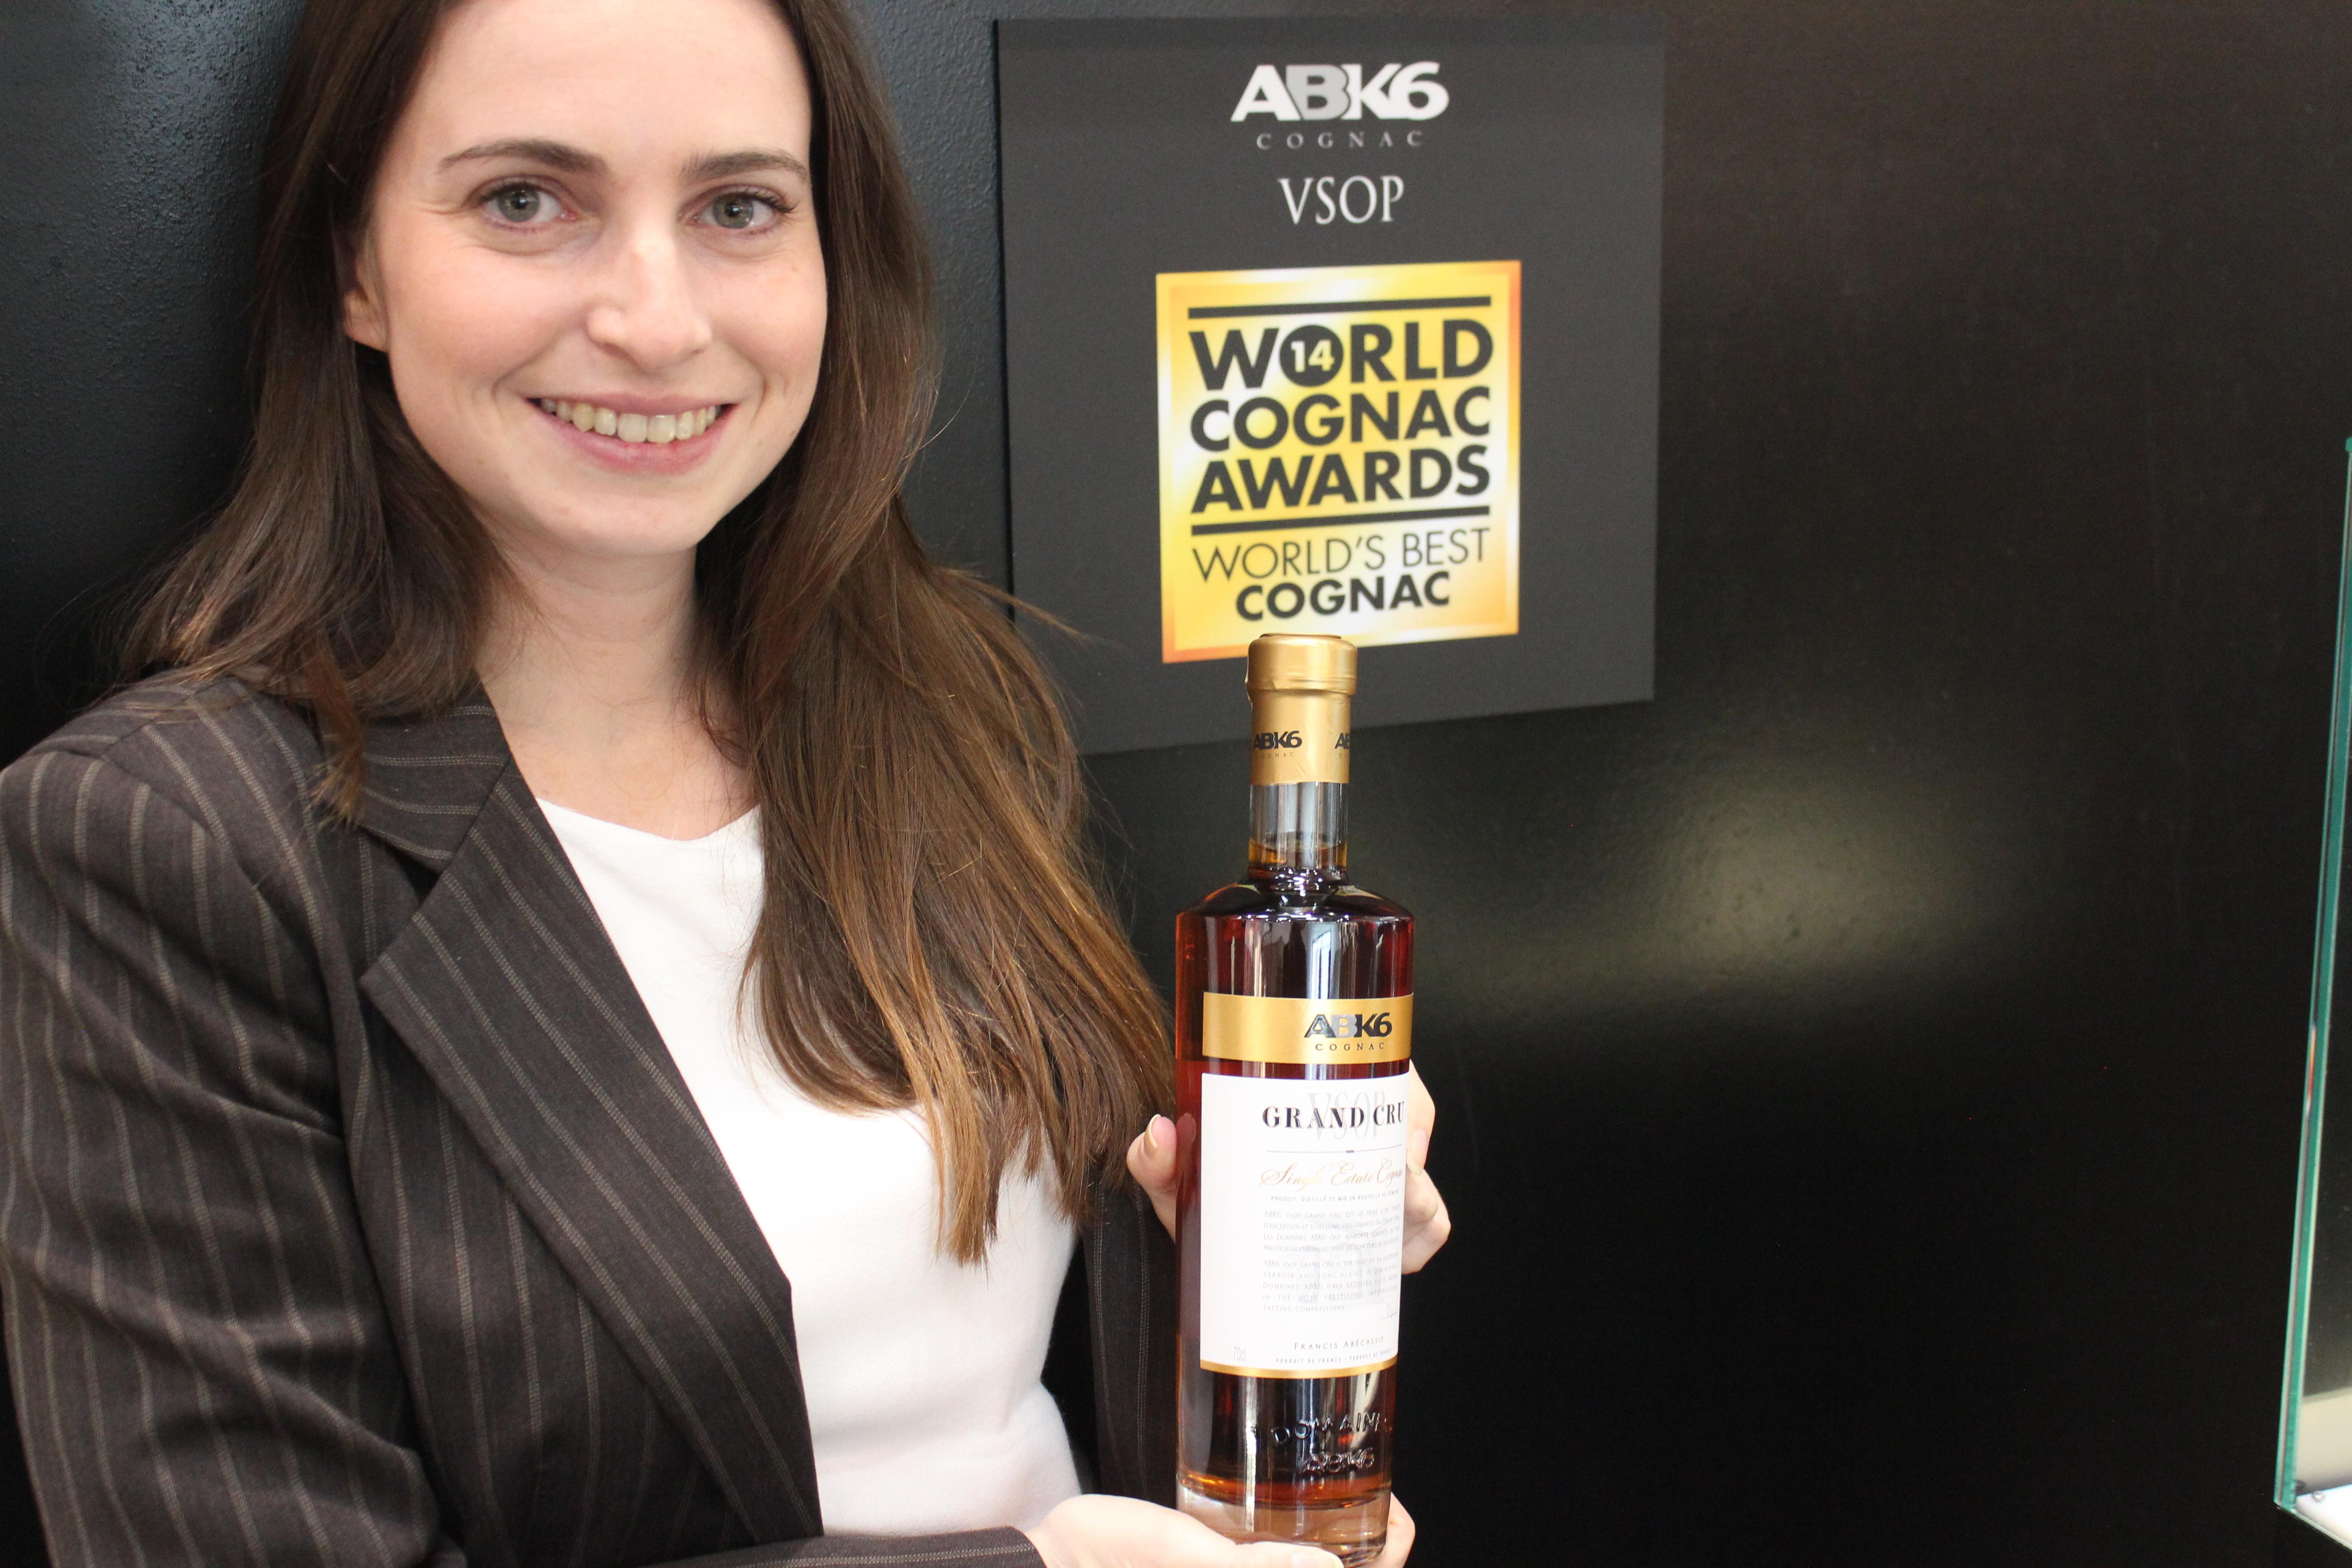 Elodie presenting the award winning Single Estate VSOP of ABK6